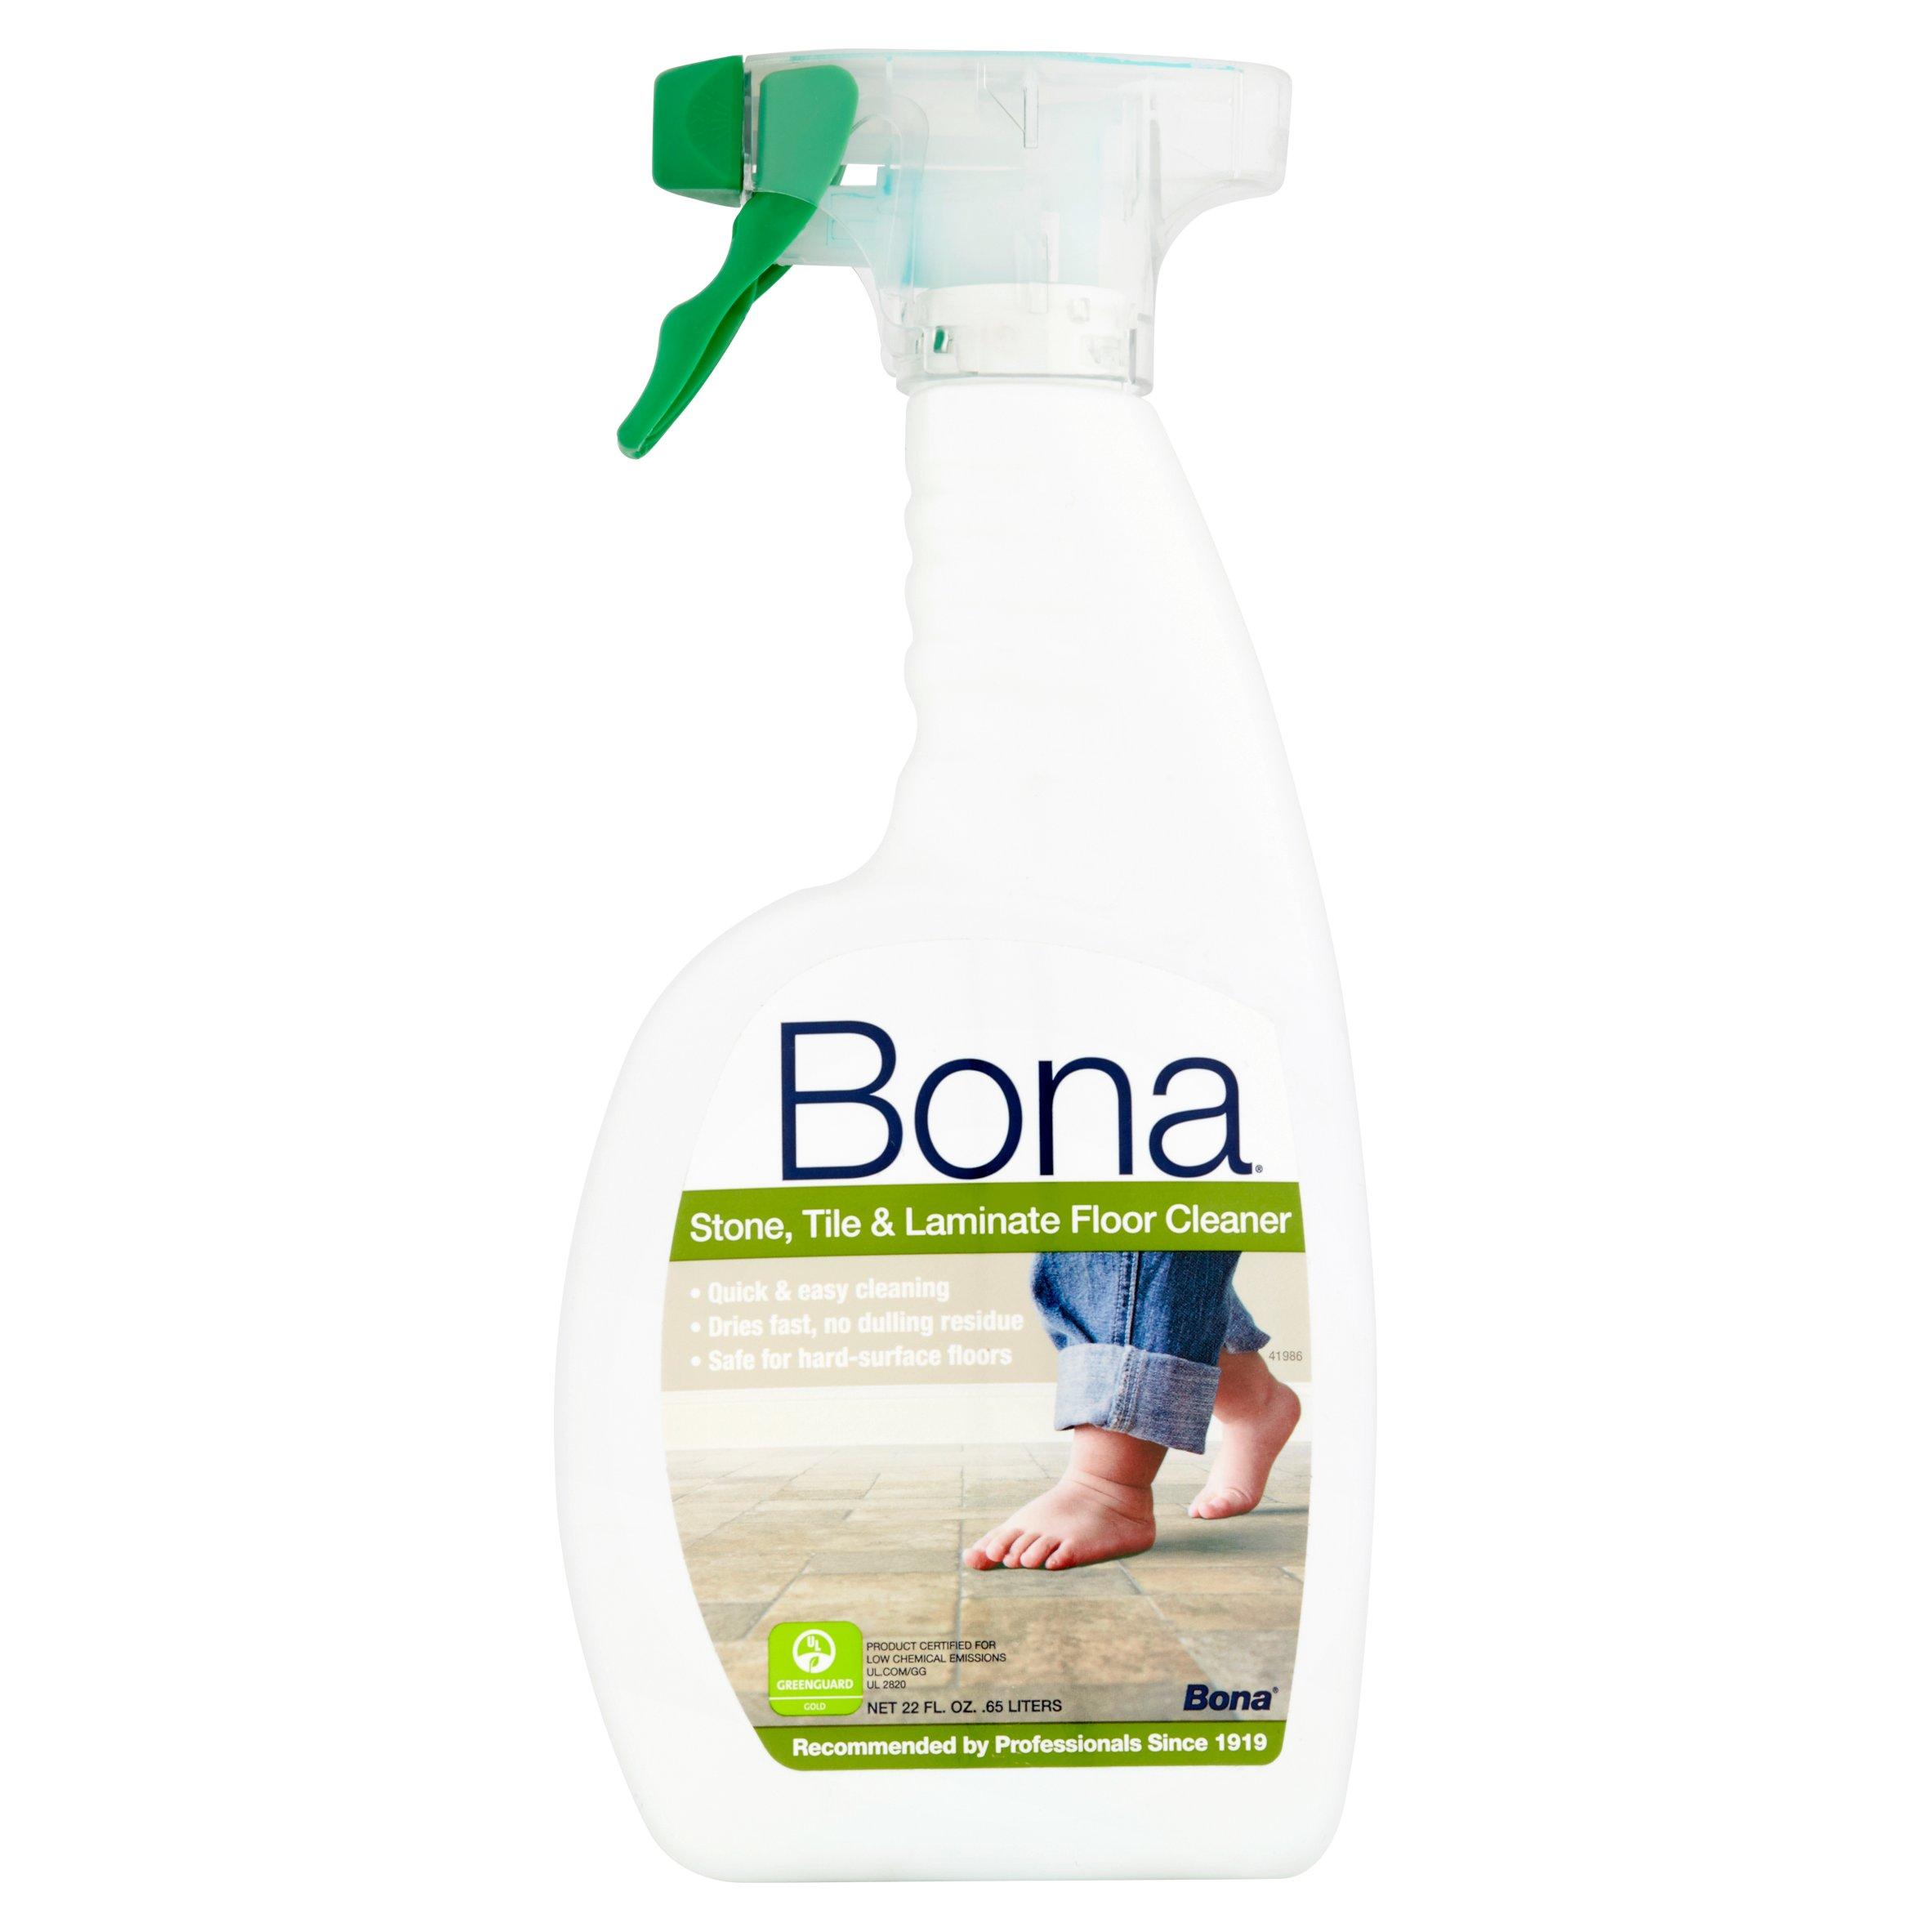 Home gt accessories gt bona pro series vinyl multipurpose cleaner - Bona Swedish Formula Stone Tile Laminate Floor Cleaner 22 Oz